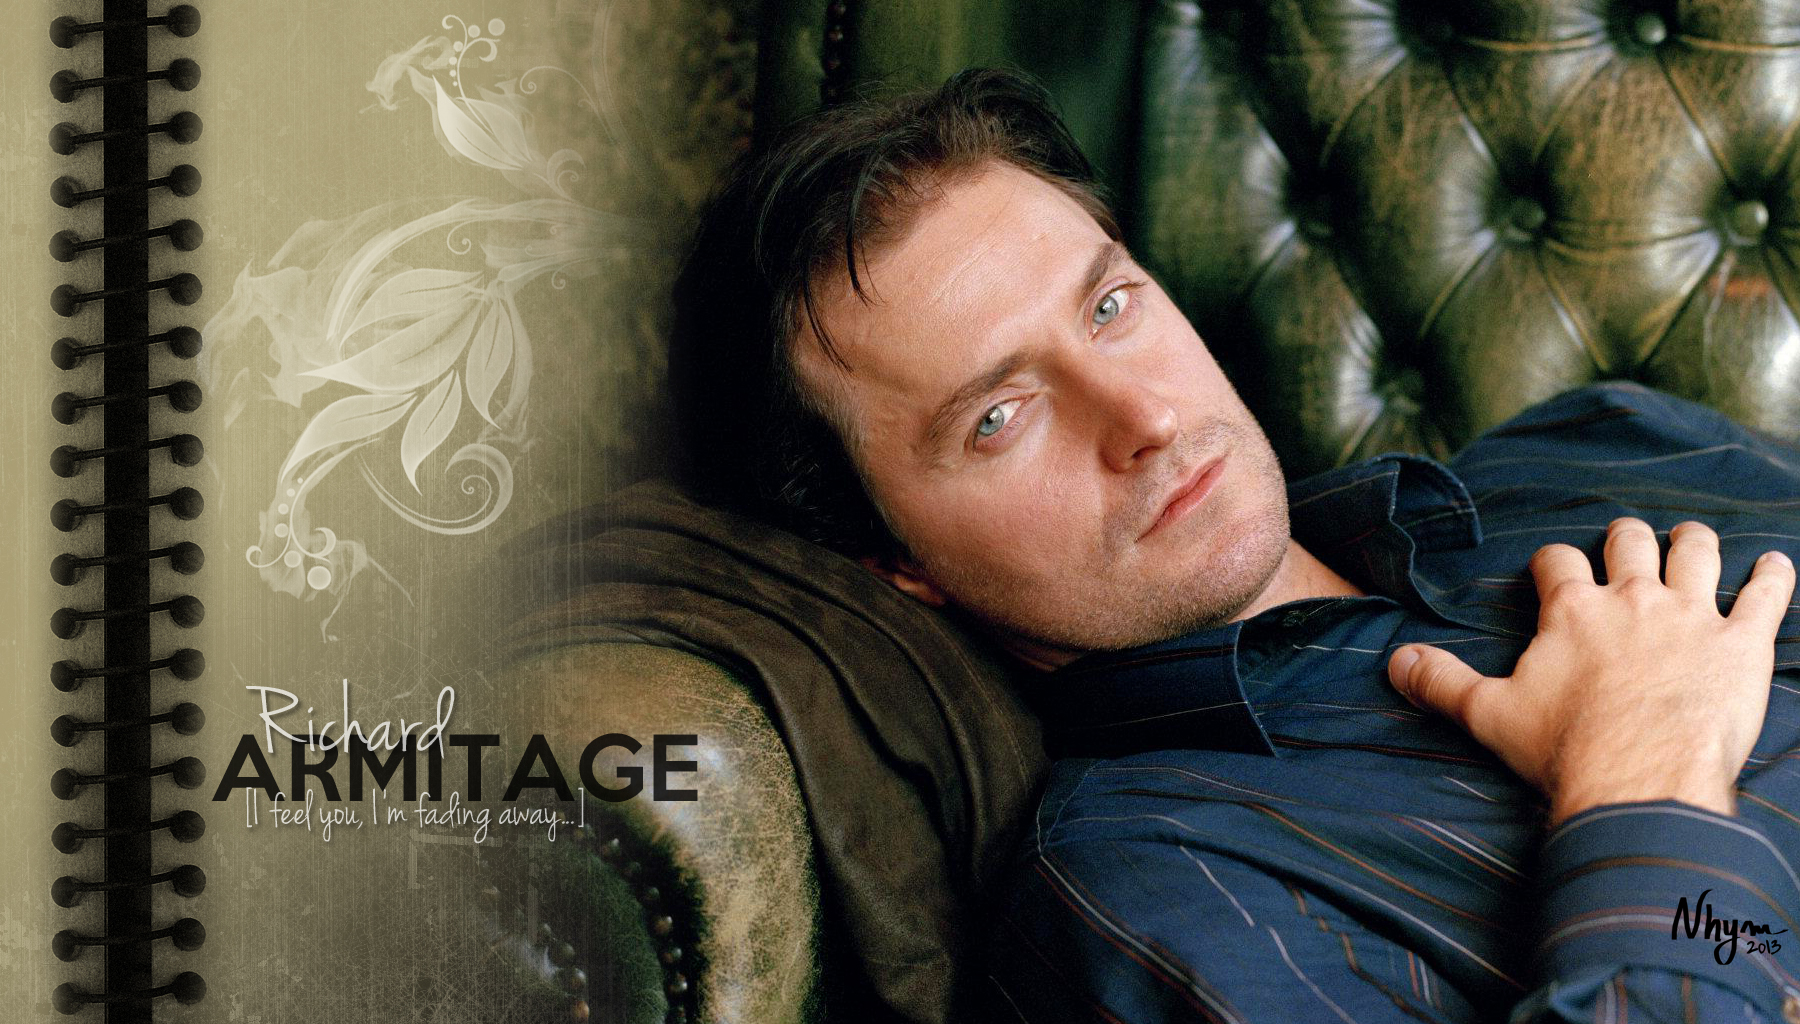 Richard Armitage Wallpaper   Richard Armitage Photo 1800x1024